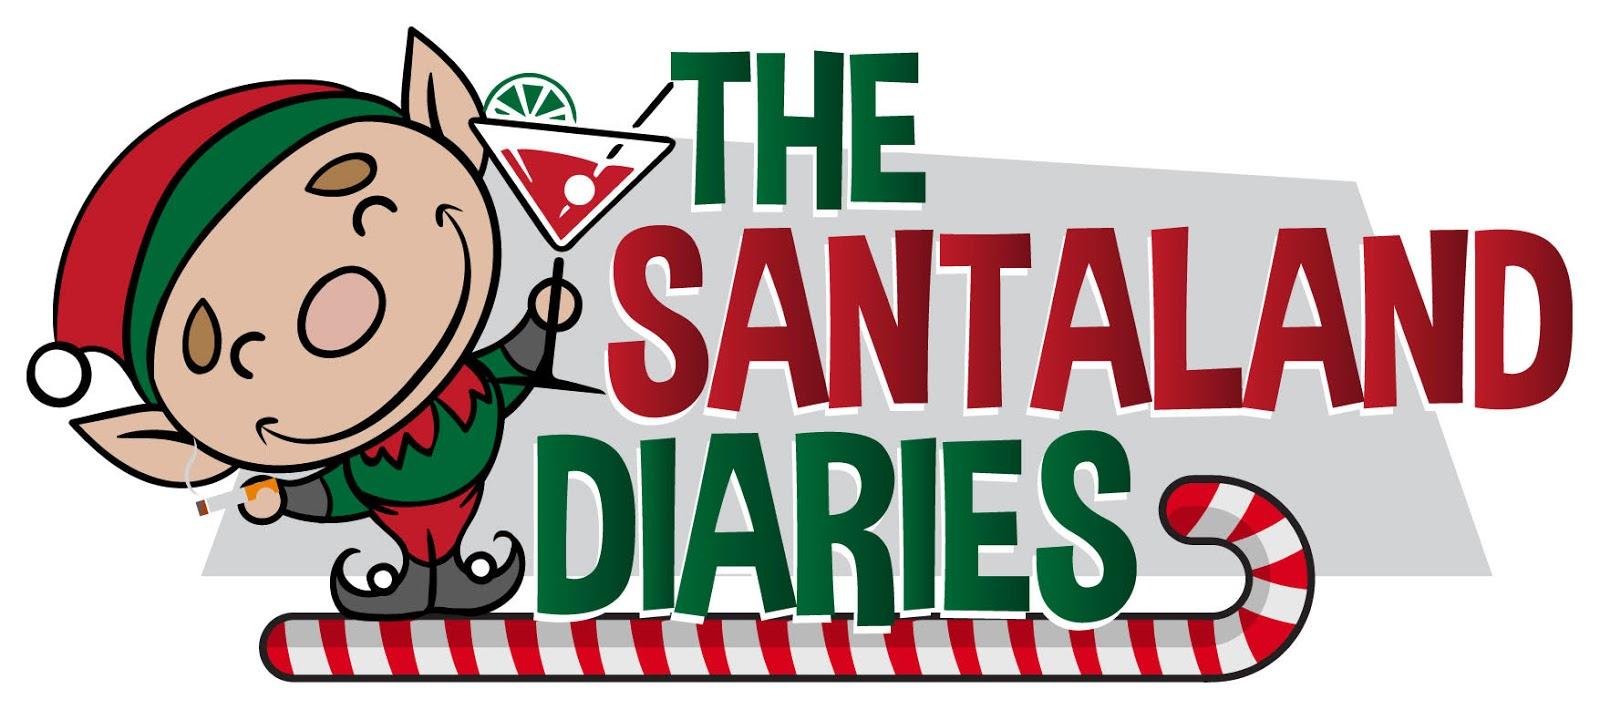 The santaland diaries essay